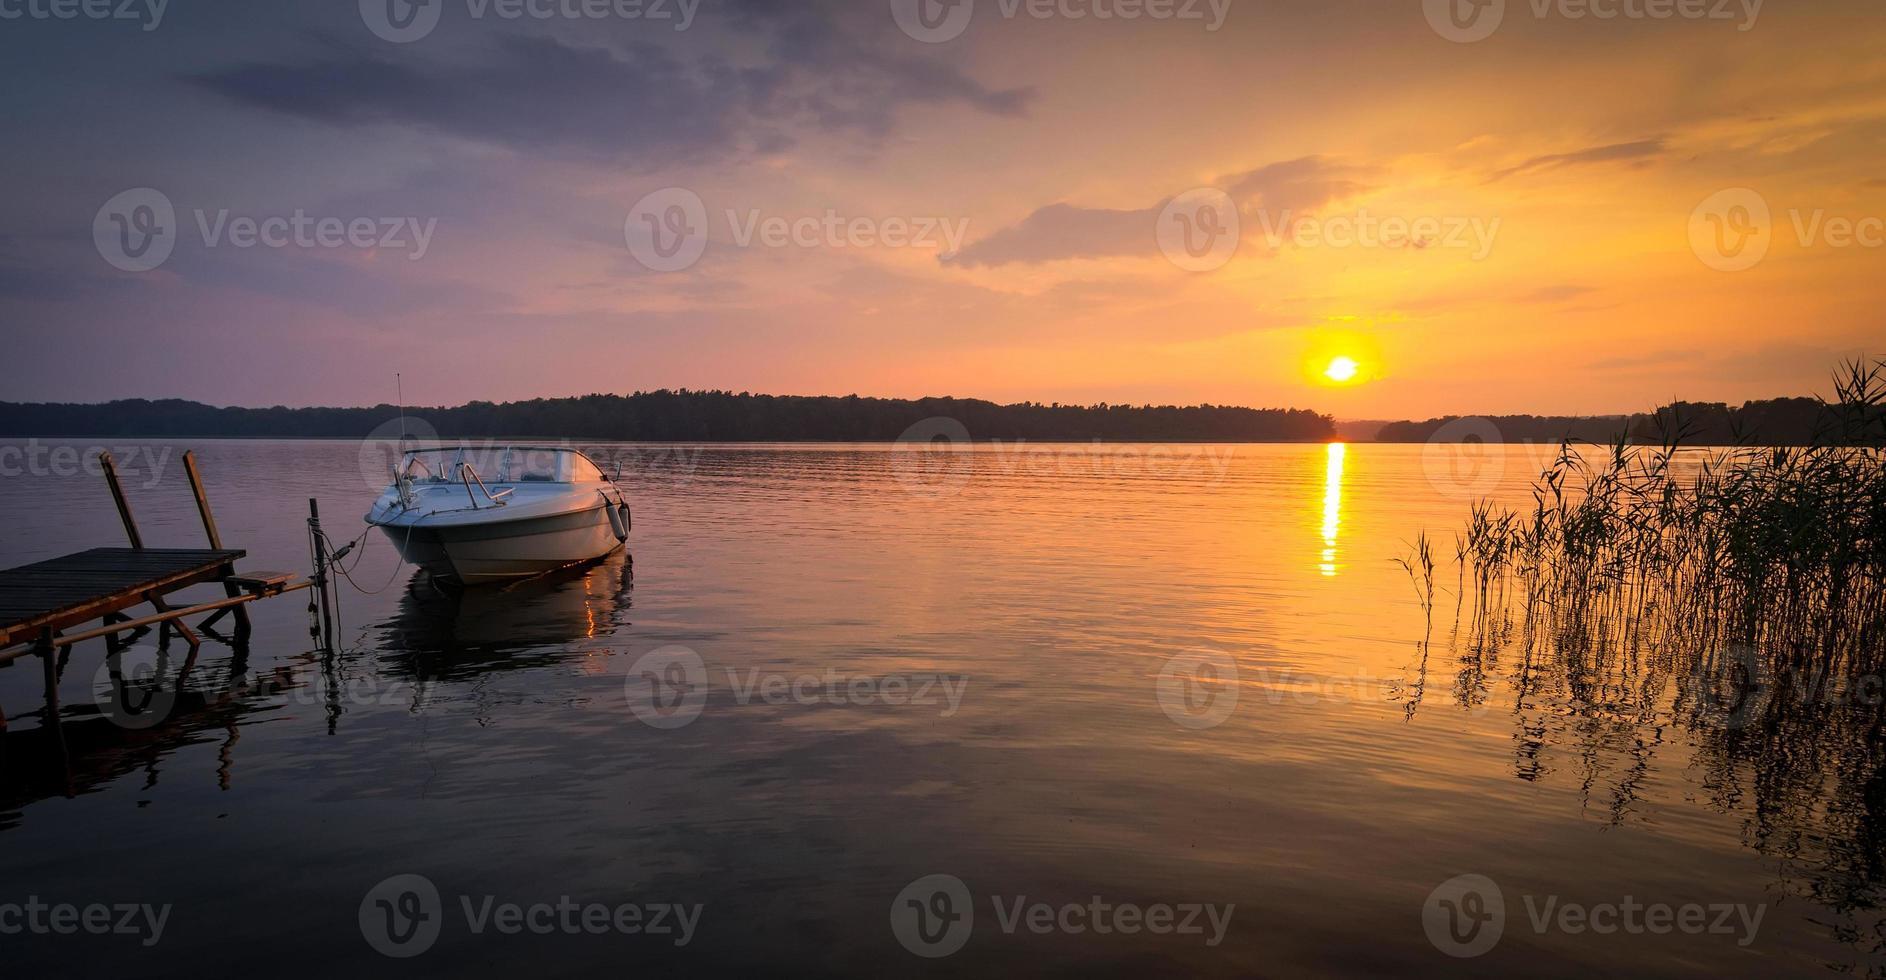 meer zomer zonsondergang foto